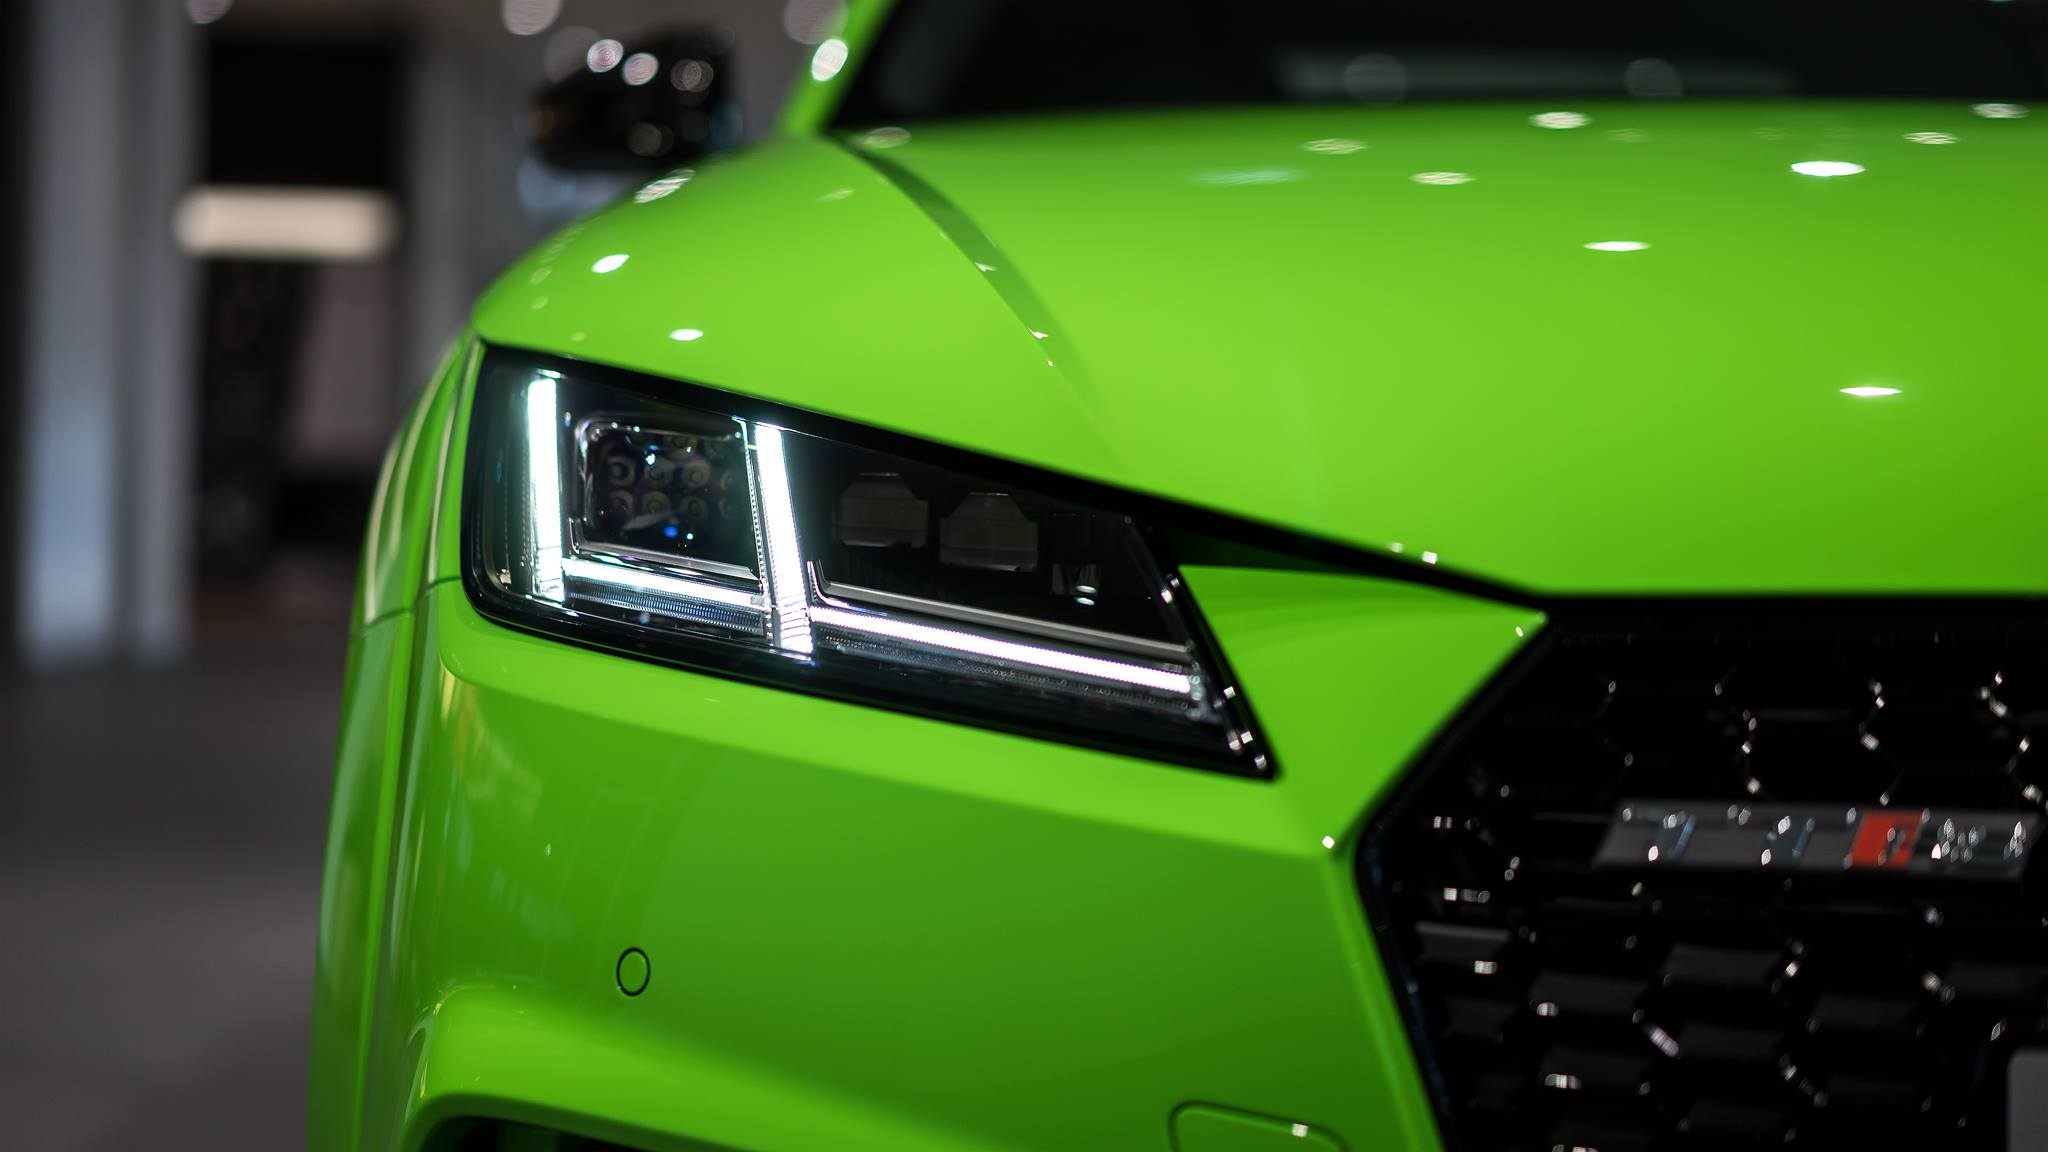 Exotic Cars Wallpaper Pack 66 400 Audi Tt Rs Coupe In Green Looks Like A Lamborghini